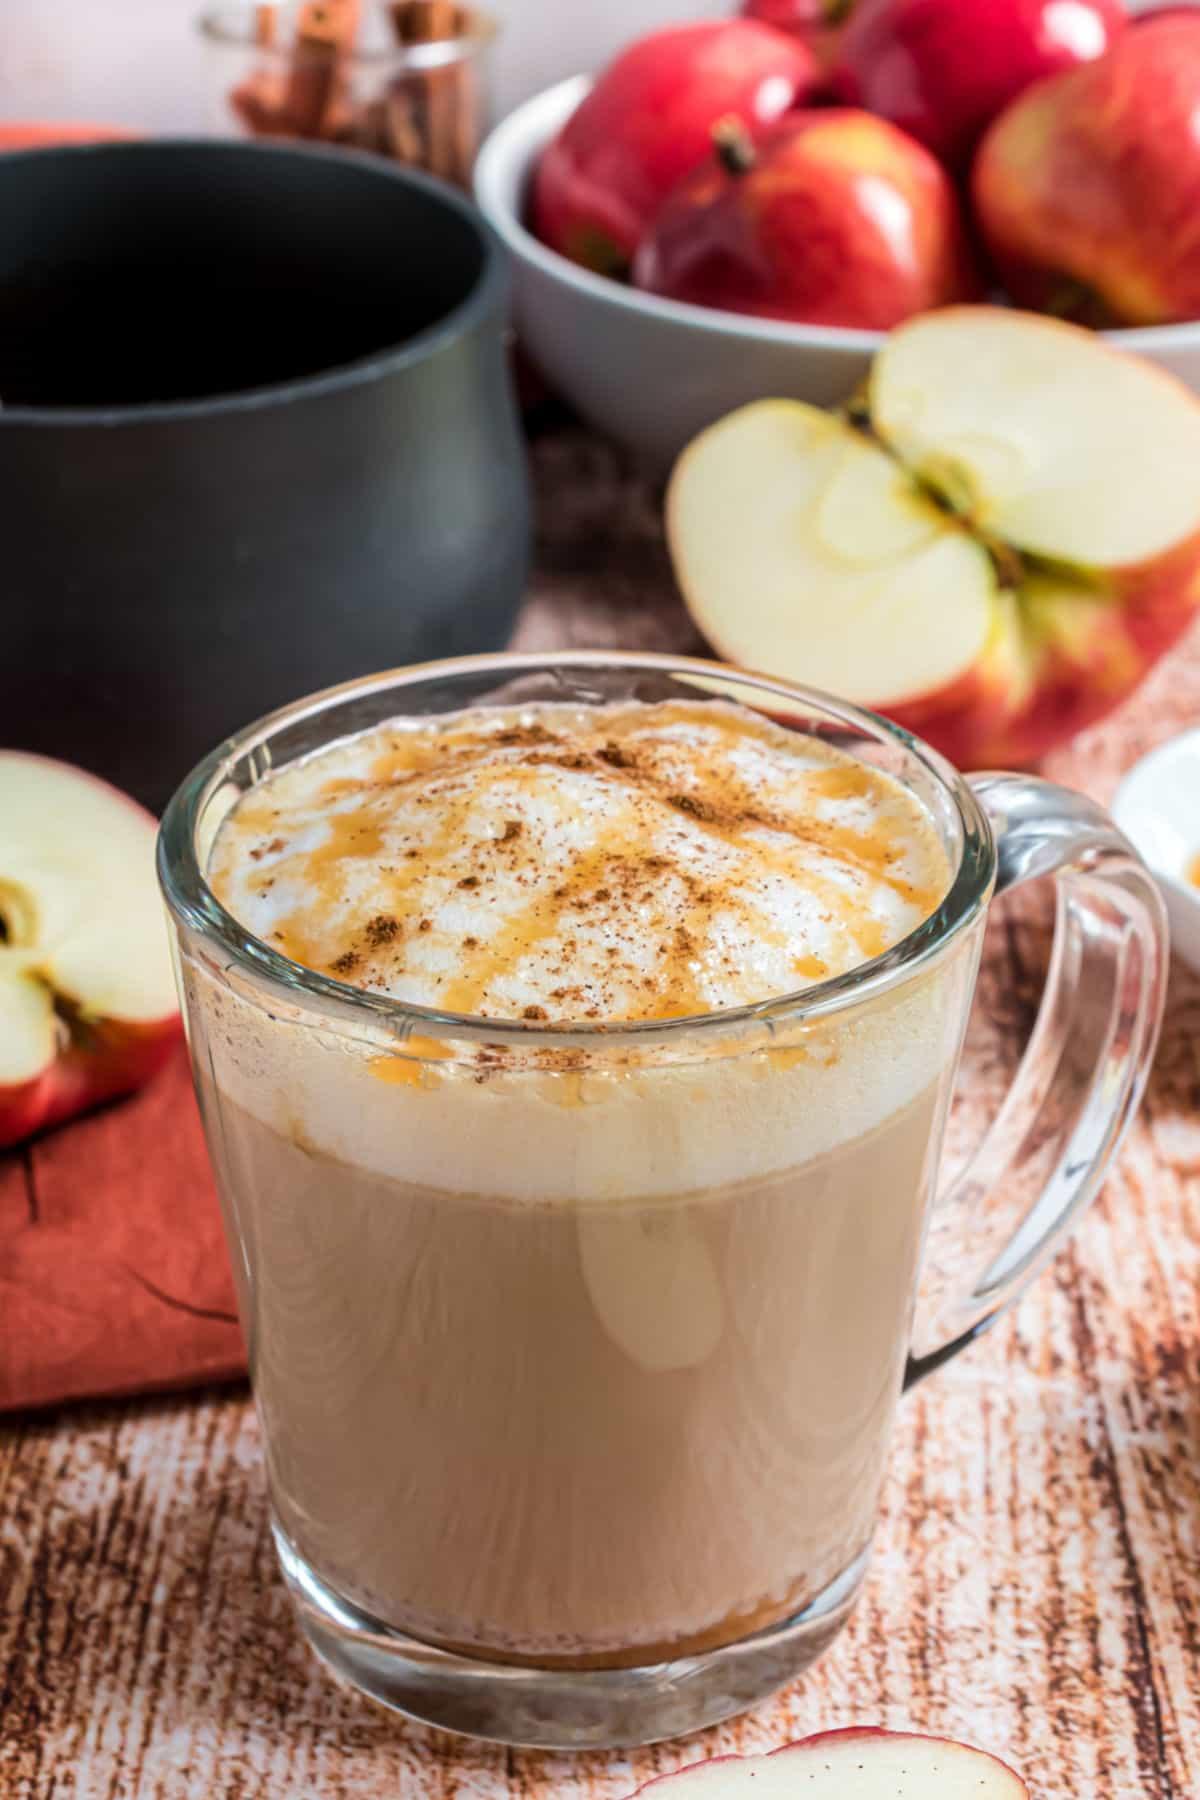 Copycat starbucks apple crisp macchiato in a clear glass mug.